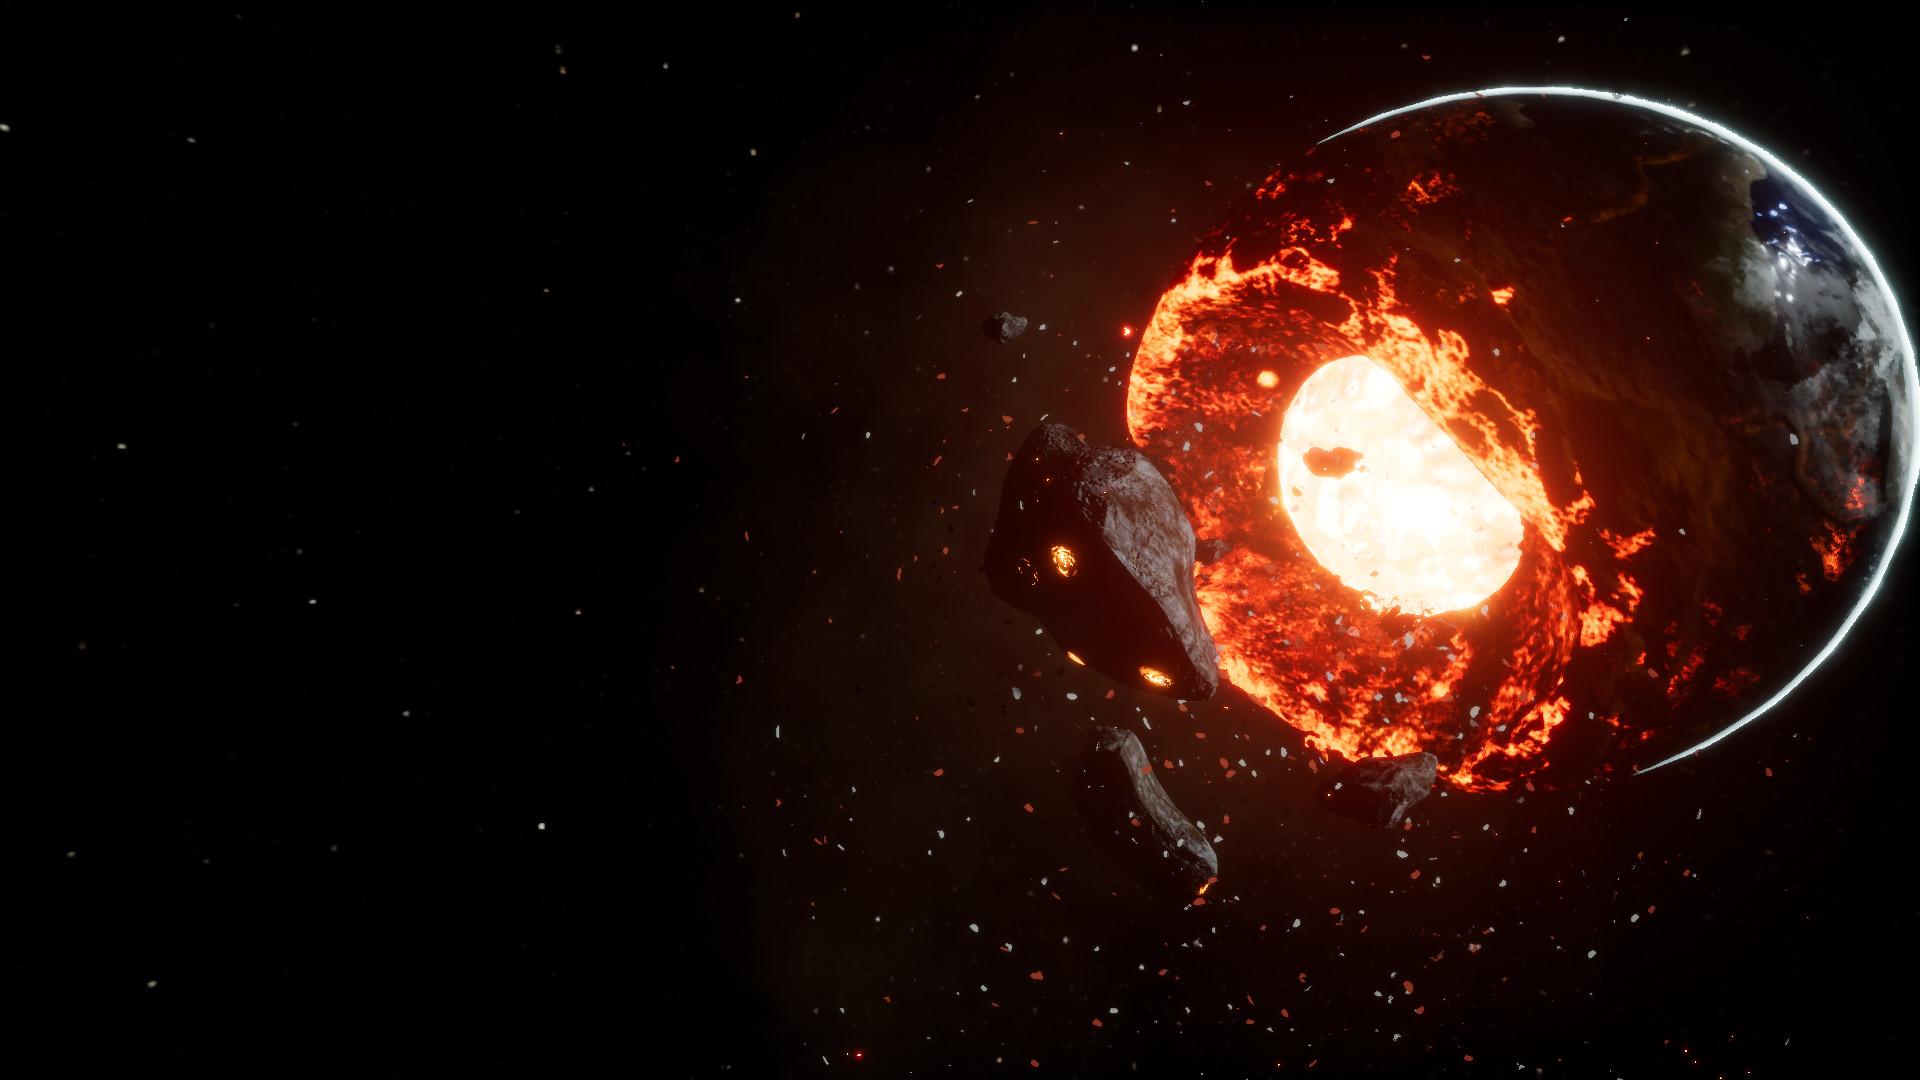 ArtStation  Destroyed Planet Thomas Barber